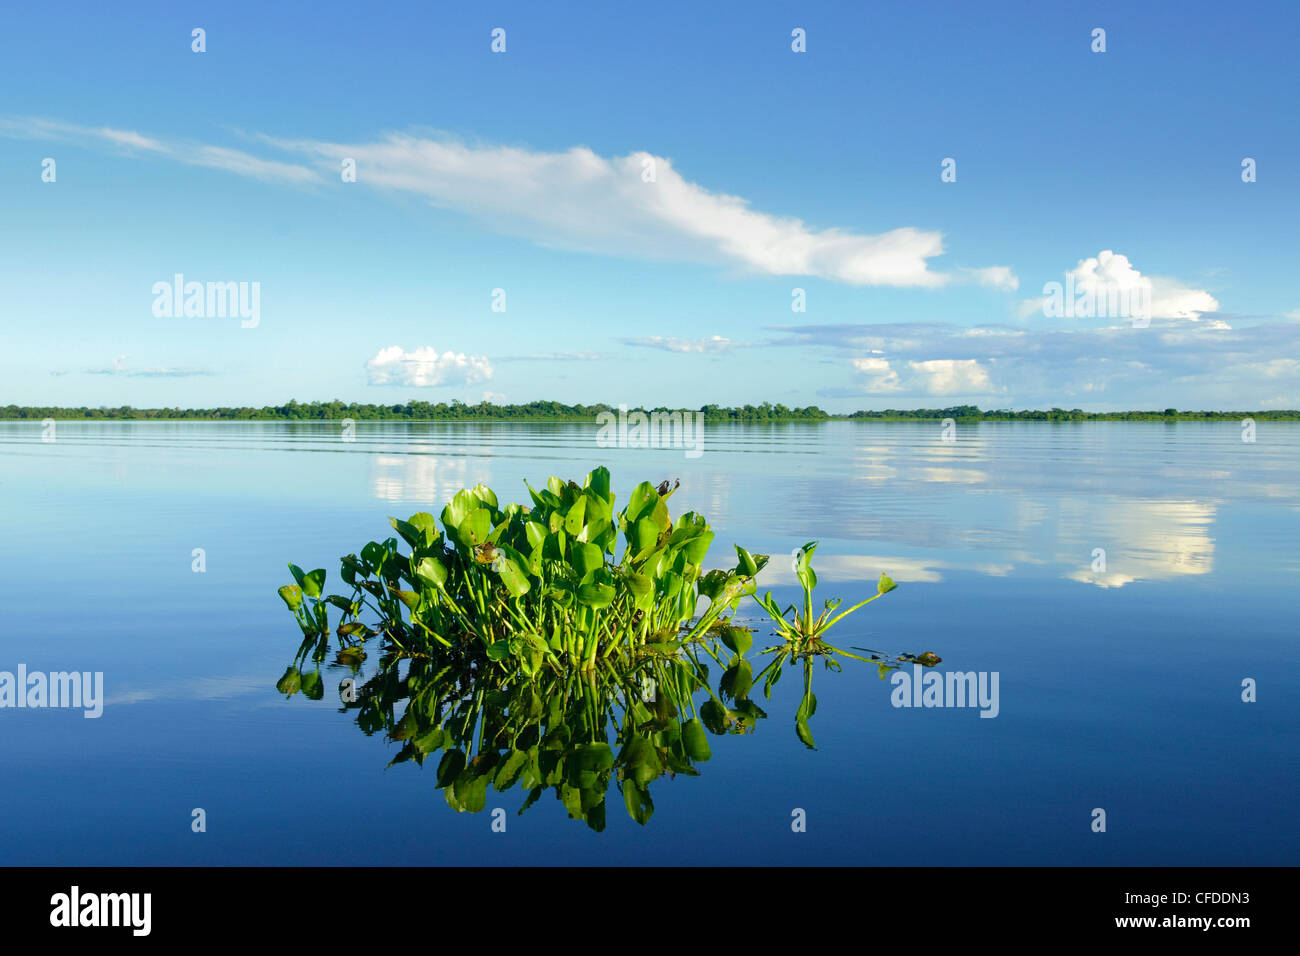 Water hyacinth (Eichhornia crassipes), Pantanal wetlands, Southwestern Brazil, South America - Stock Image